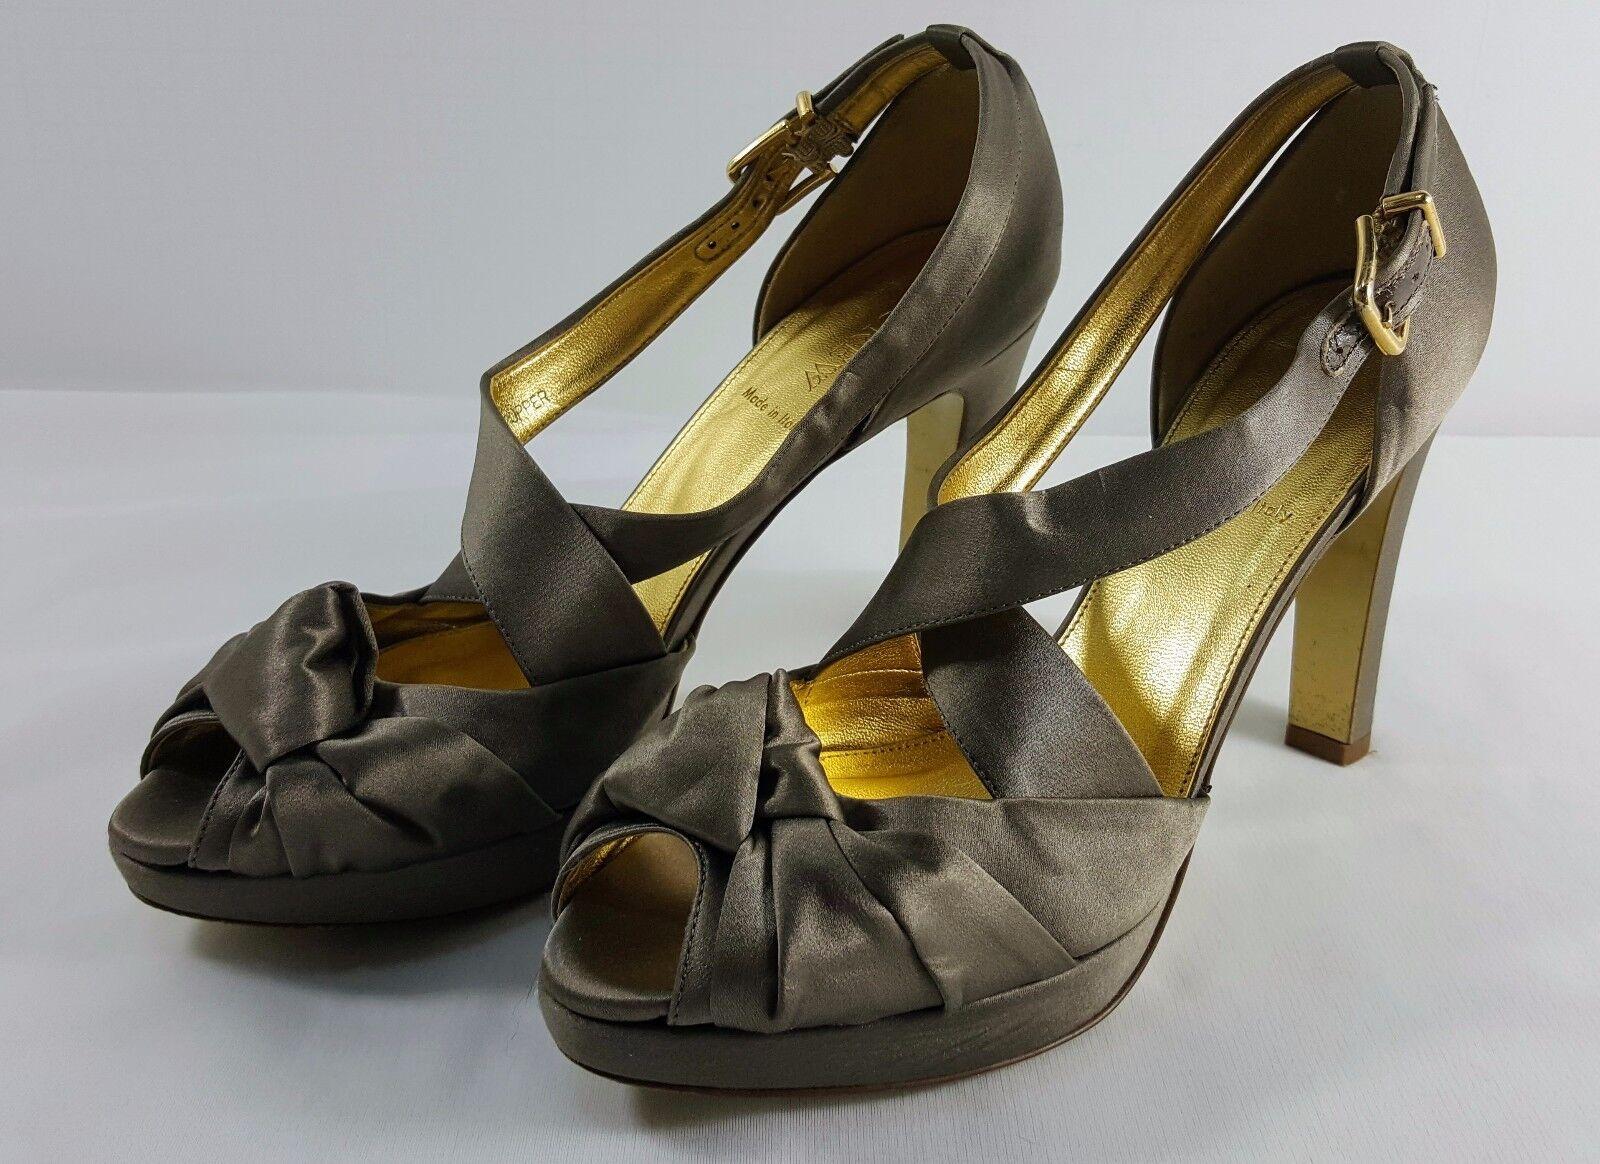 J. Crew Light Brown Tan Satin Bow Open Toe Pump 4.25 Shoes Size 9.5 Womens 4.25 Pump heel 11edef